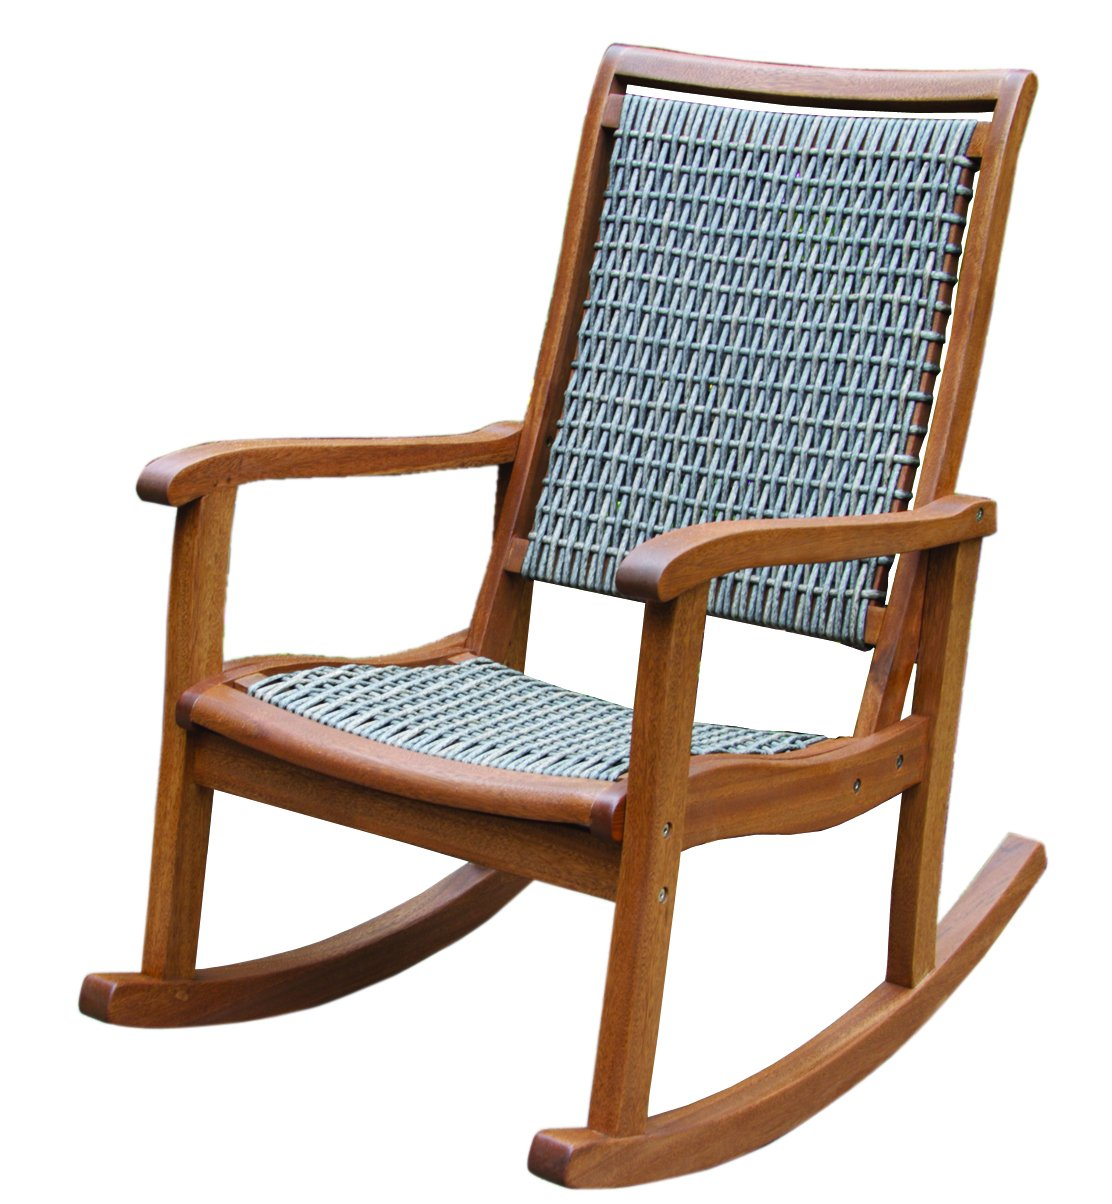 Amazon.com : Outdoor Interiors Resin Wicker And Eucalyptus Rocking Chair,  Brown And Grey : Garden U0026 Outdoor